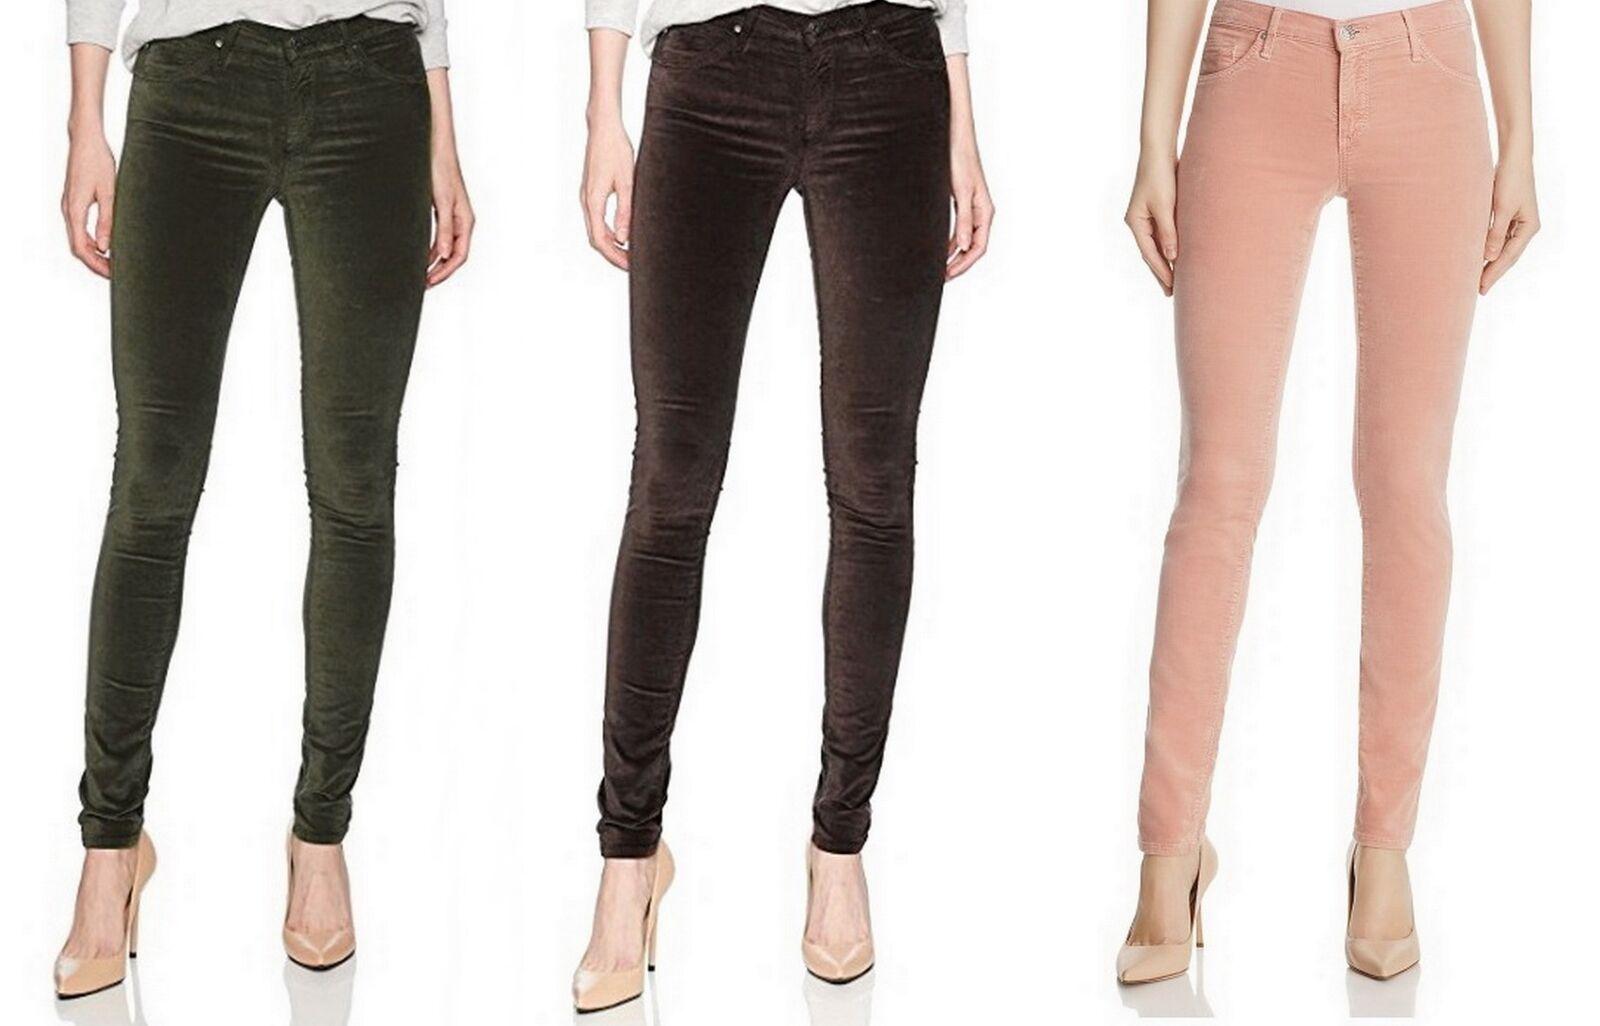 Adriano Goldschmied le legging velours Super Skinny Jeans sz 25 28 29 30 156 F